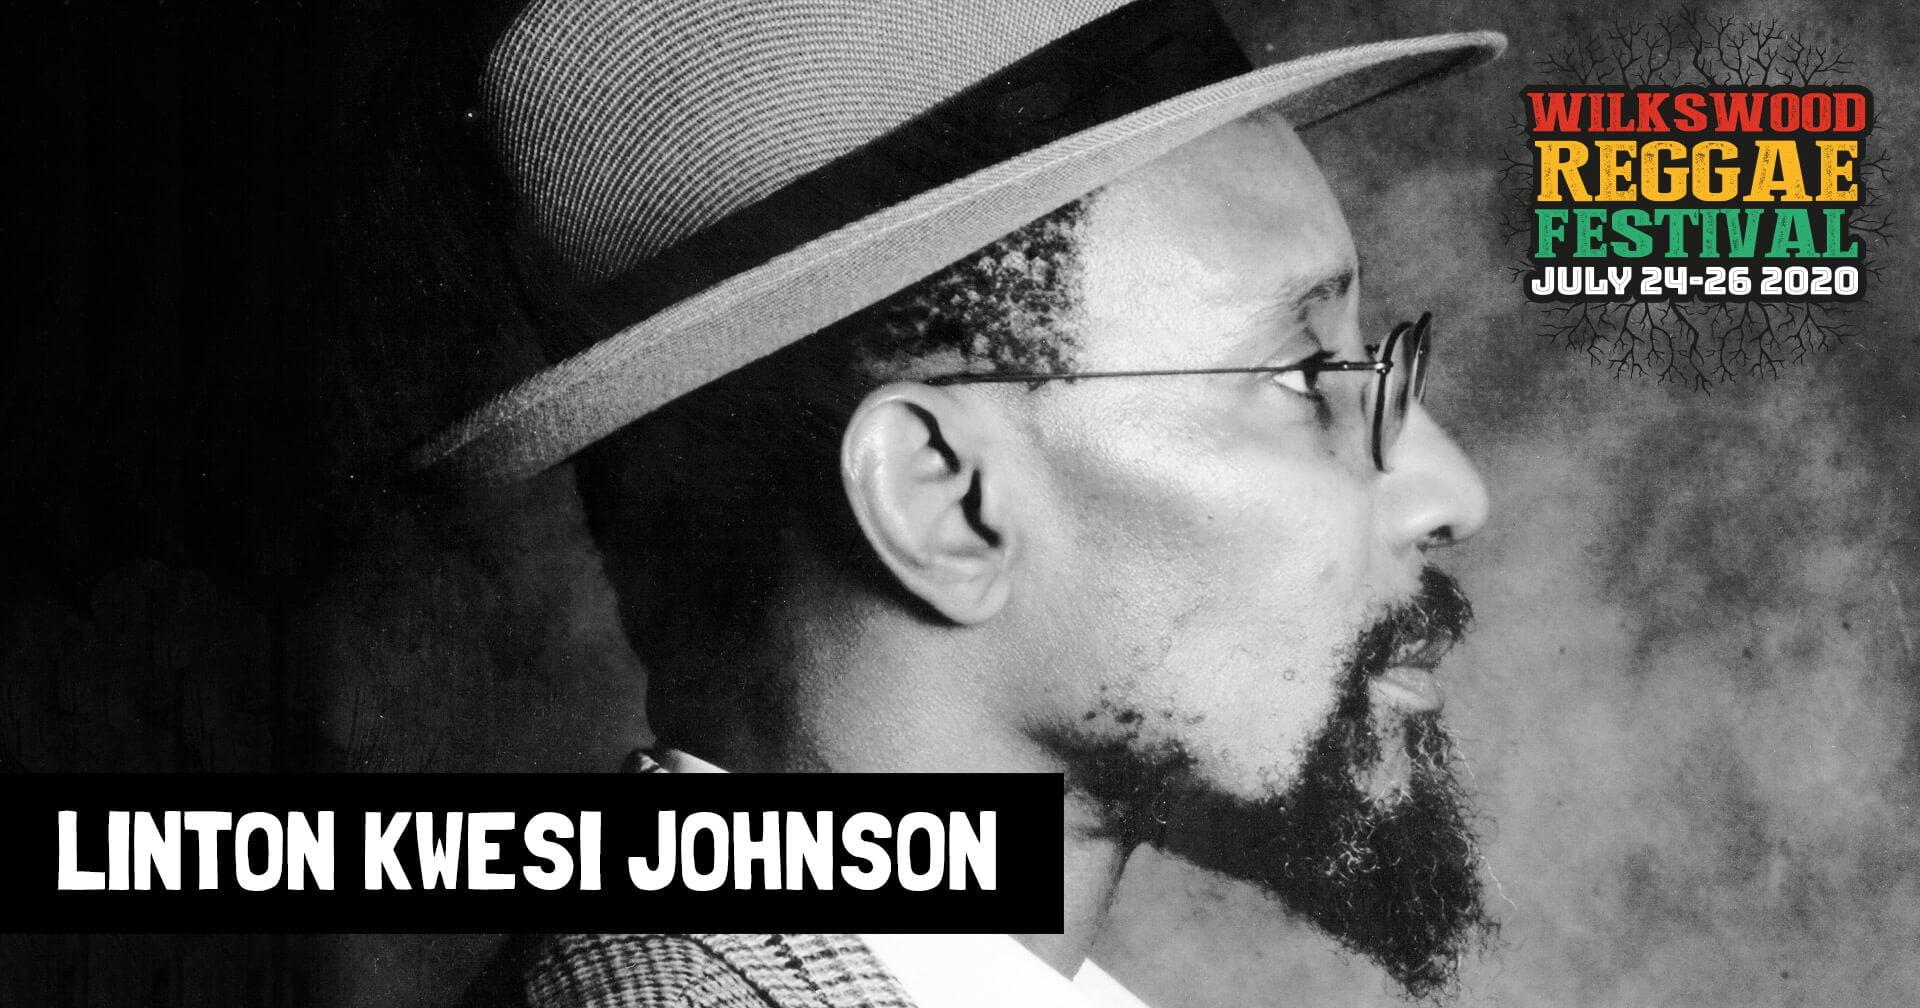 Linton Kwesi Johnson at Wilkswood Reggae 2020